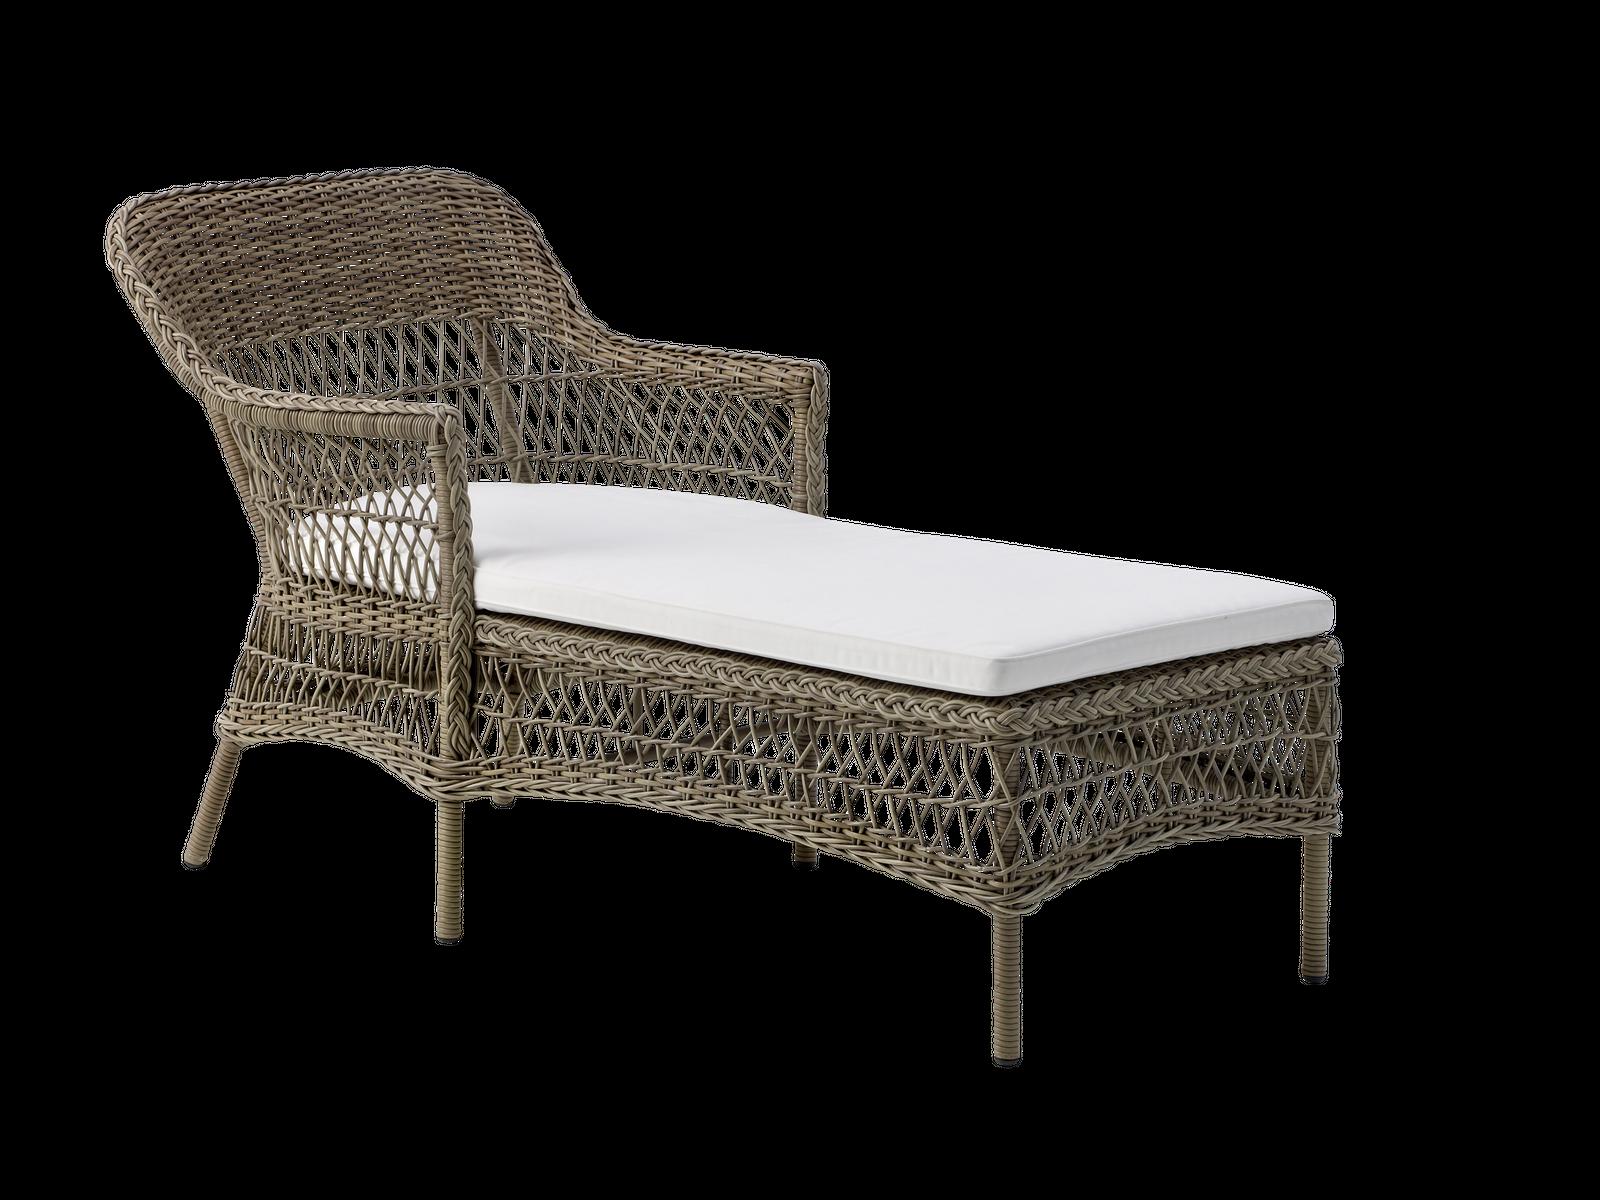 sika design outdoor rattan liege olivia mit kissen. Black Bedroom Furniture Sets. Home Design Ideas